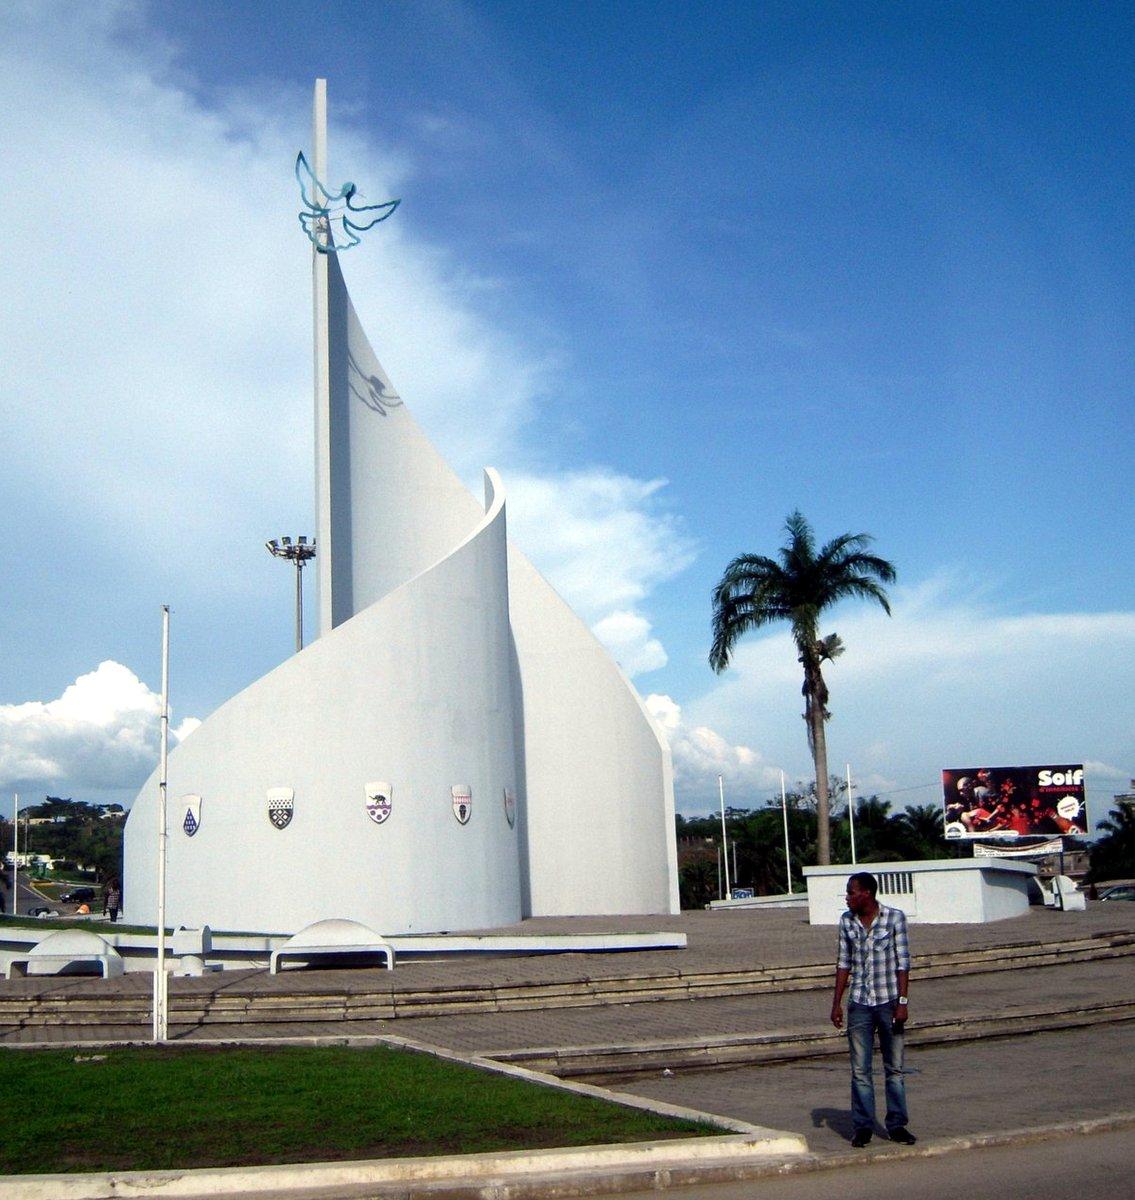 Viaggi E Pensieri: Libreville: Boulevard Triomphal